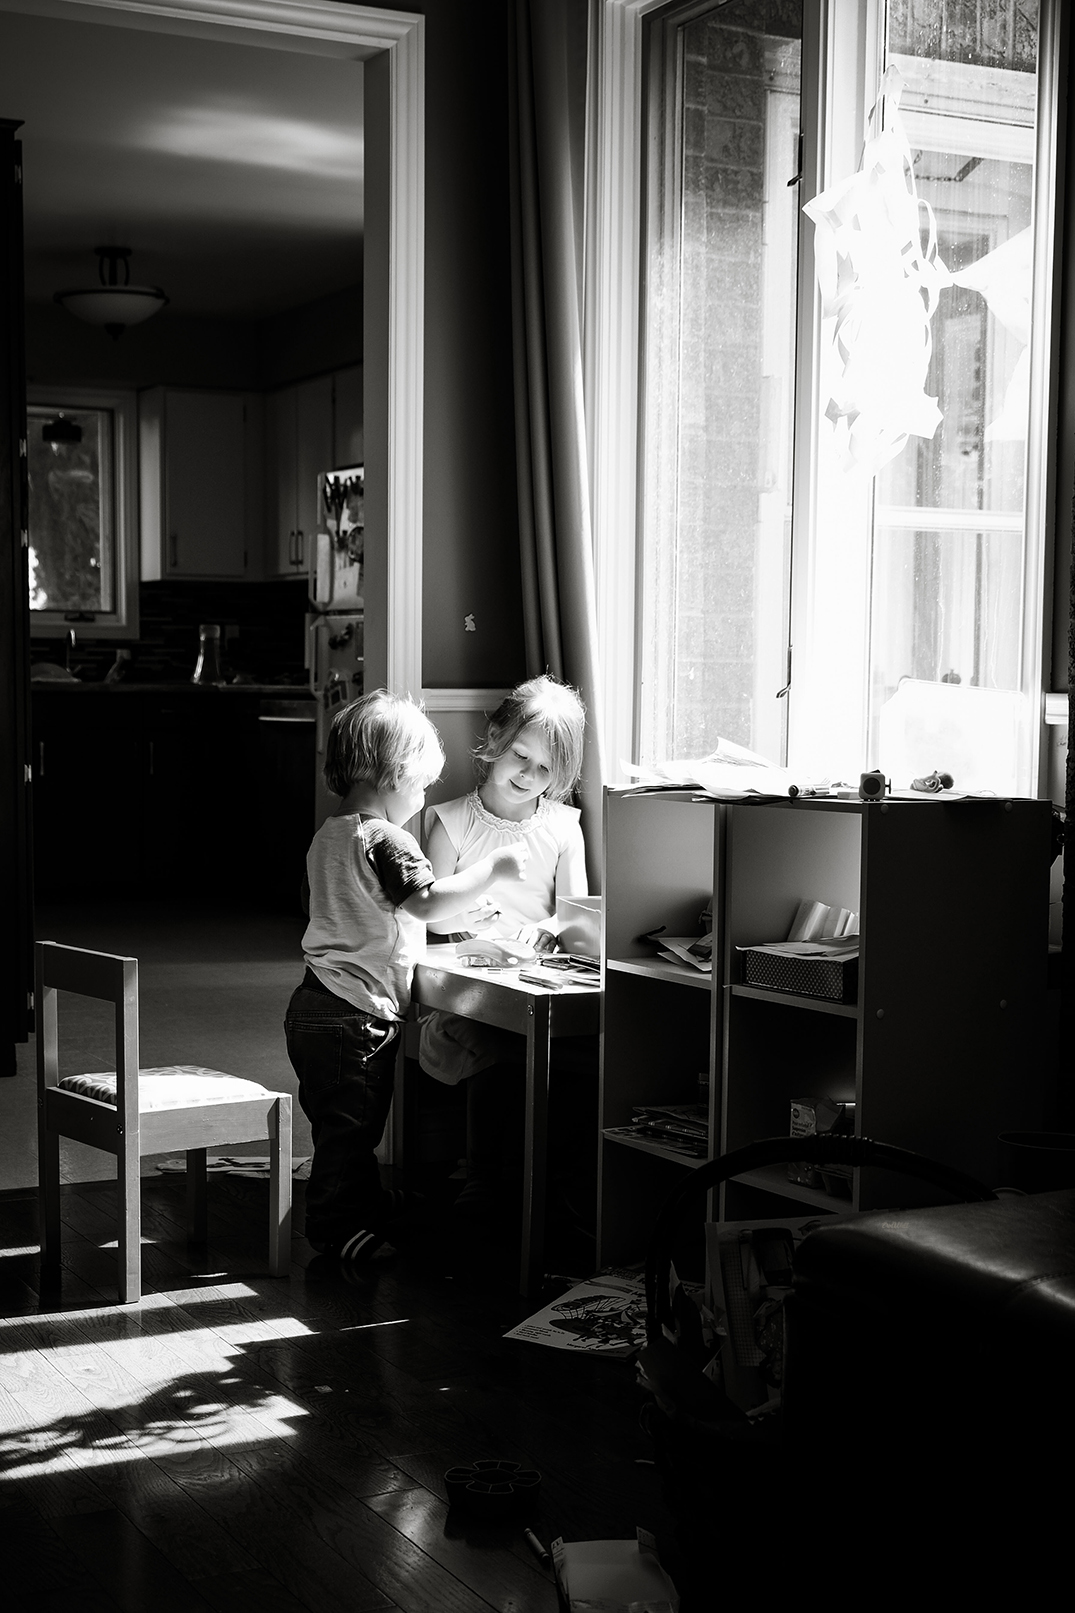 family-photography-kitchener-waterloo-17.jpg